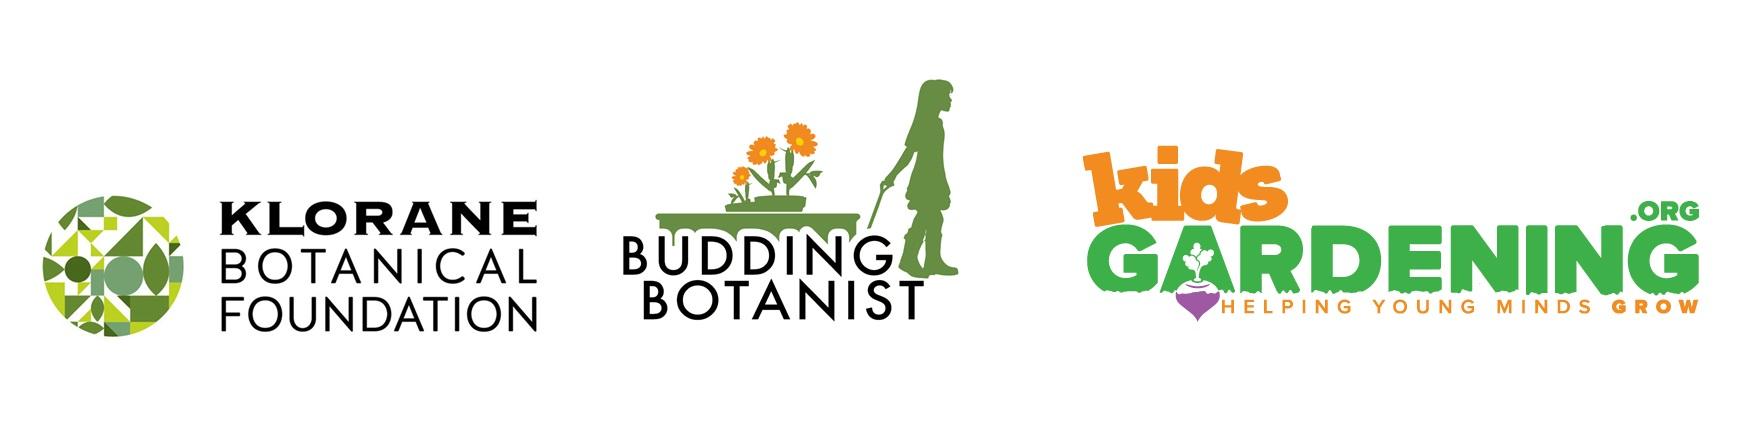 Jackson Heights' The Renaissance Charter School Wins Budding Botanist Grant